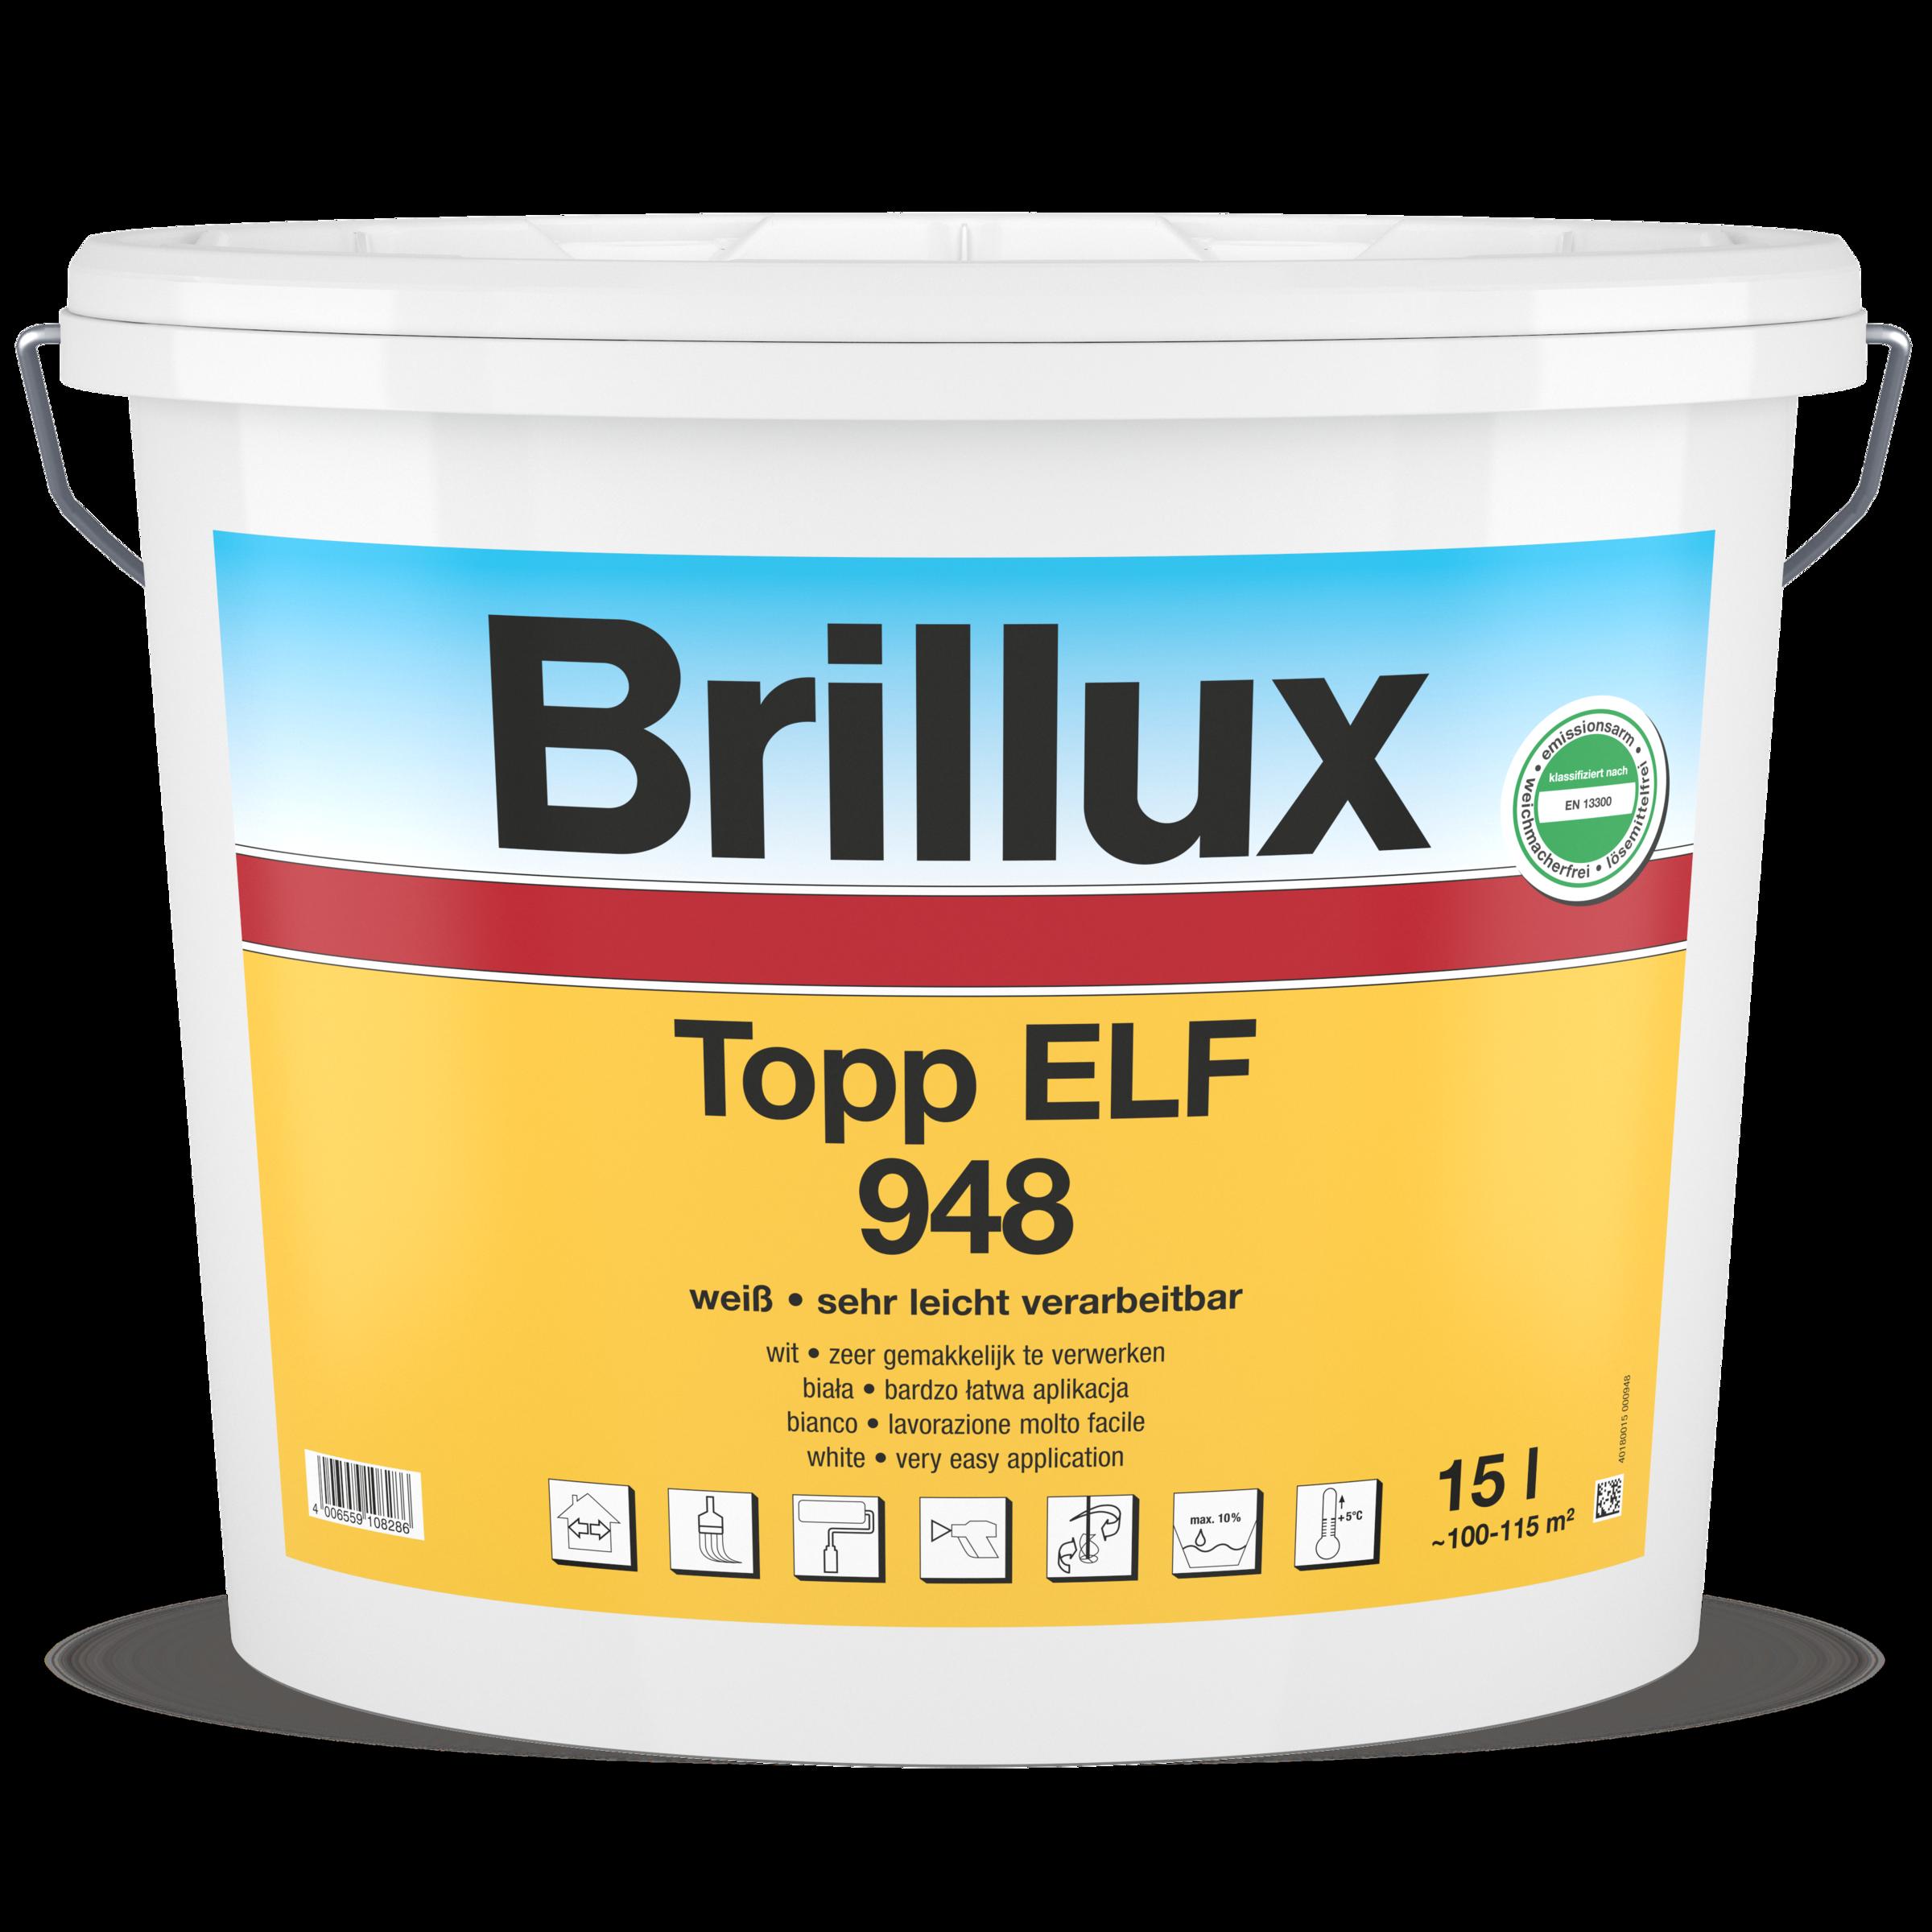 Topp ELF 948 - Farbton weiß